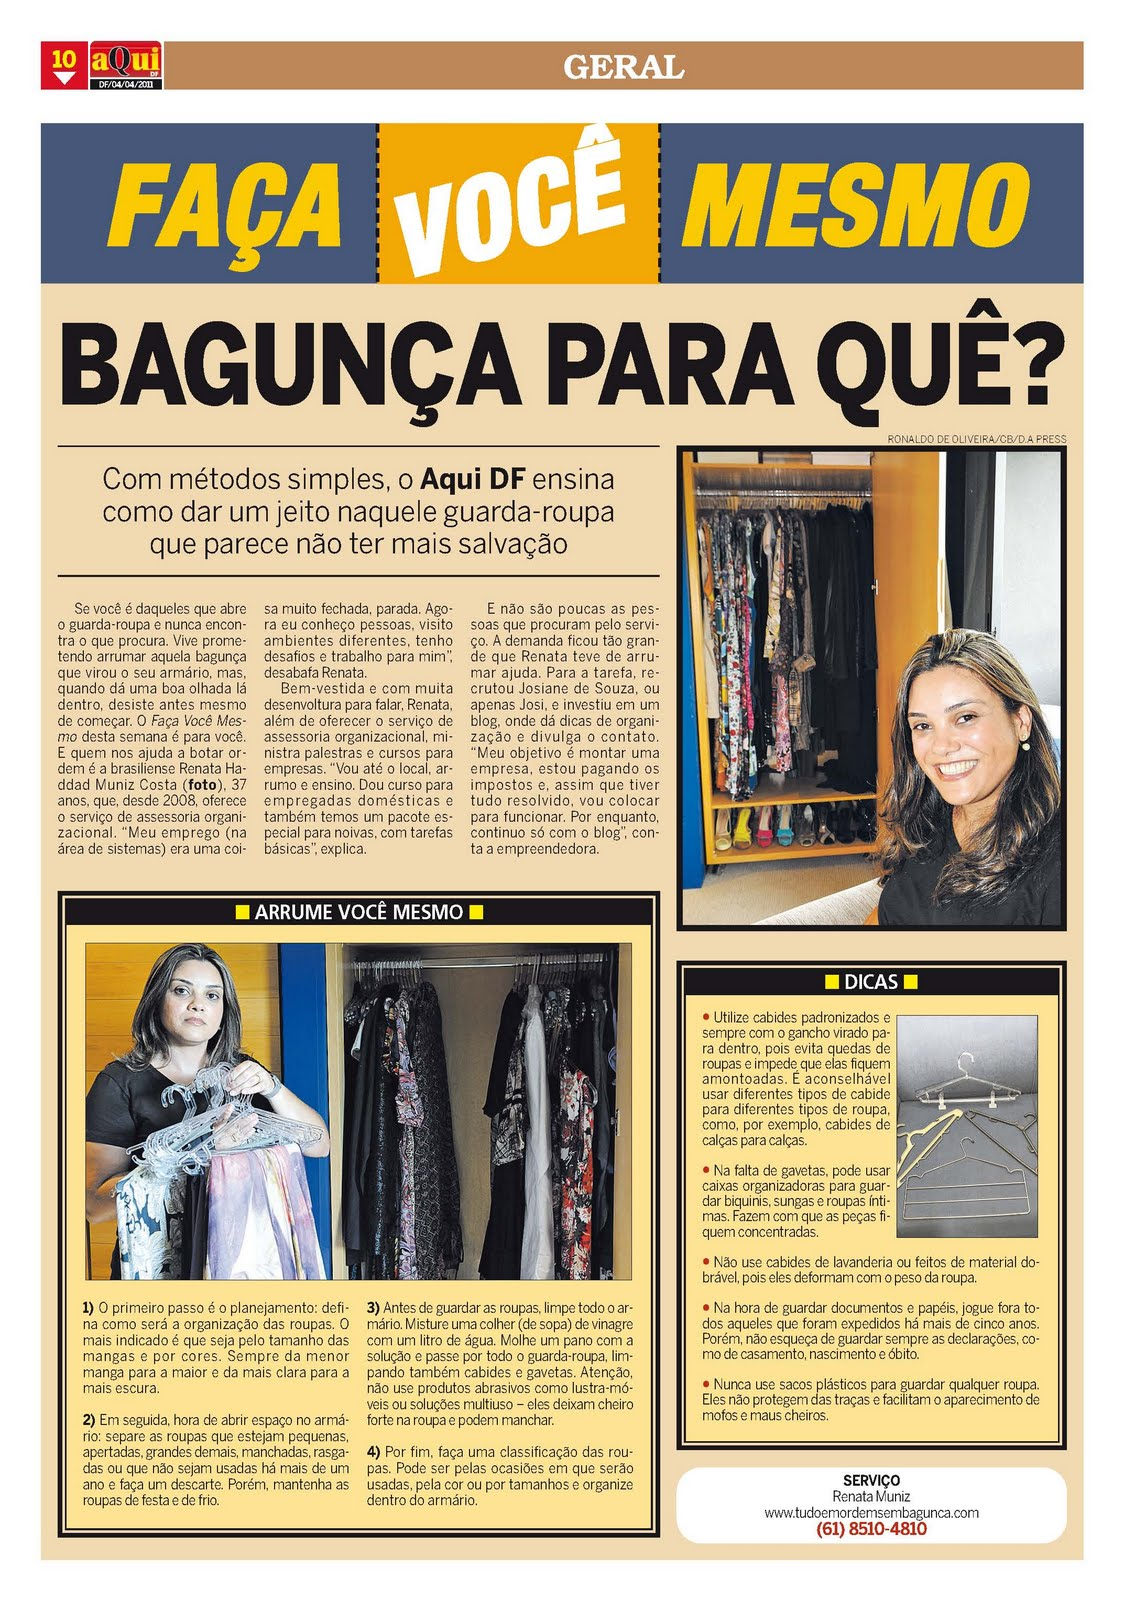 ABR/2011 -Jornal -Aqui DF.